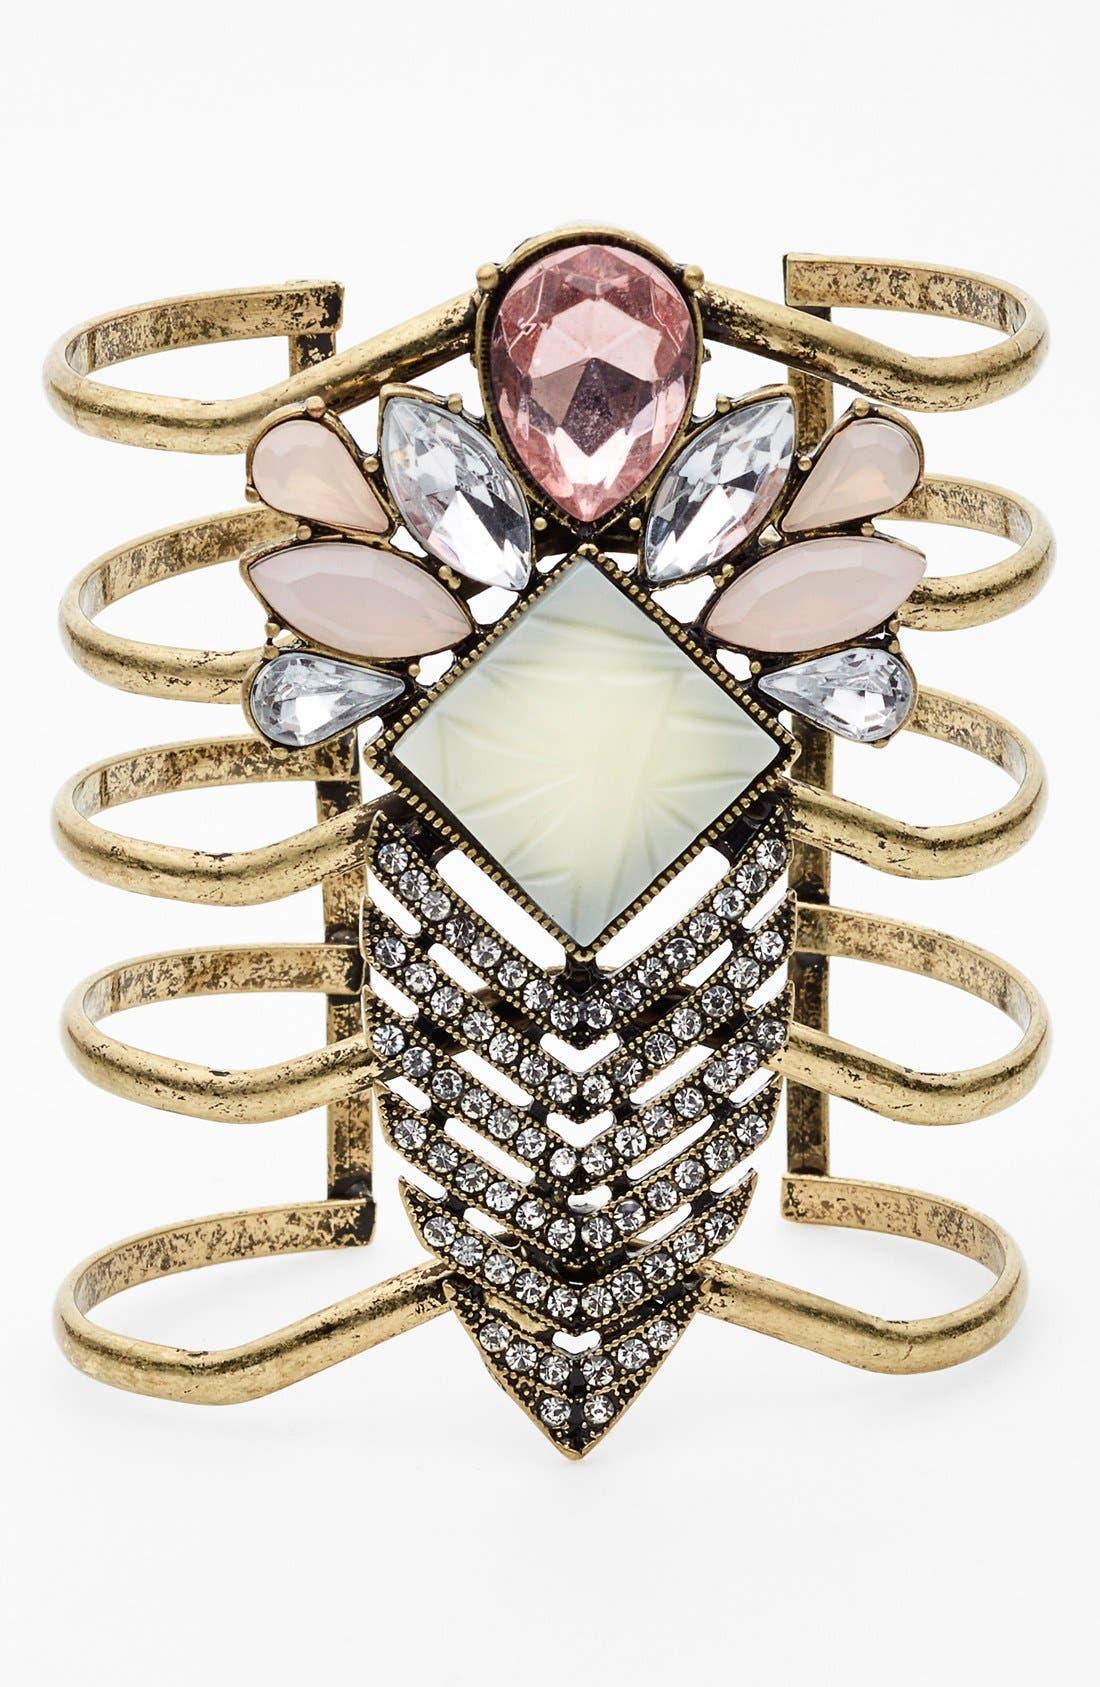 Alternate Image 1 Selected - Tildon Jewel Stone Statement Cuff